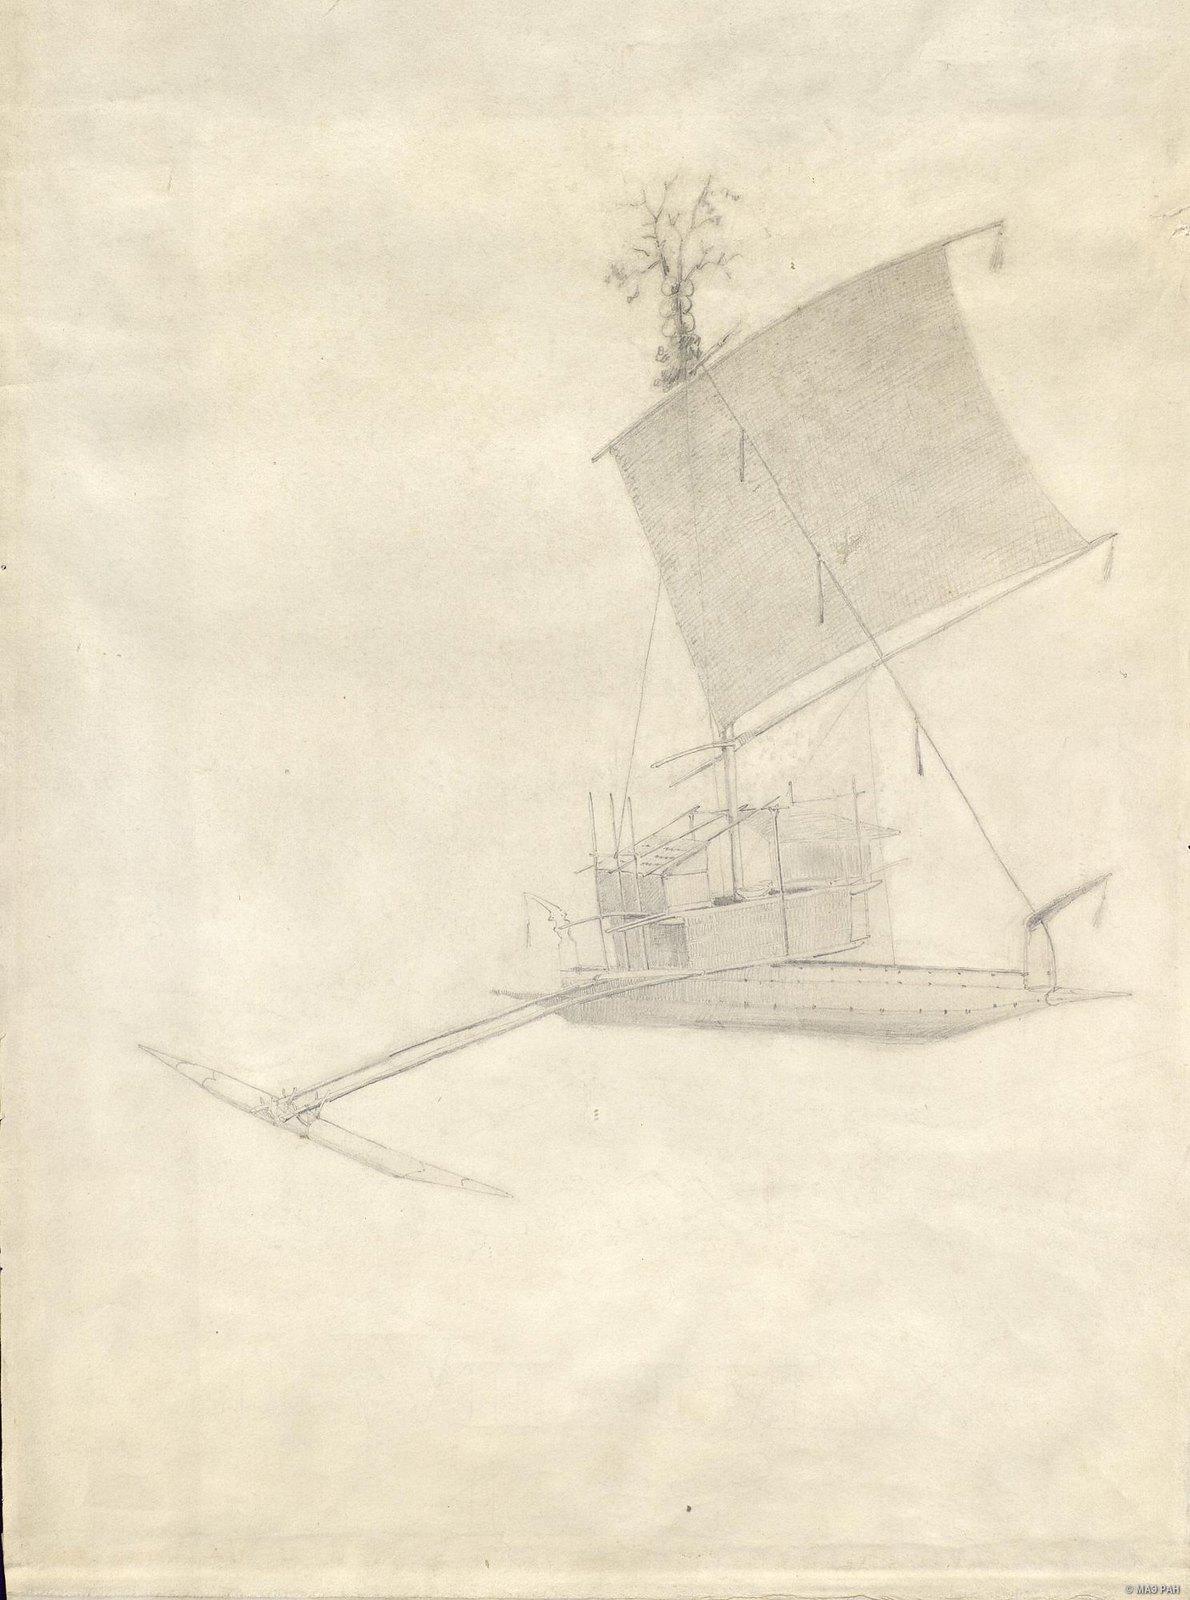 1880-е. Парусная лодка Ванг. Папуасы Новой Гвинеи (2)